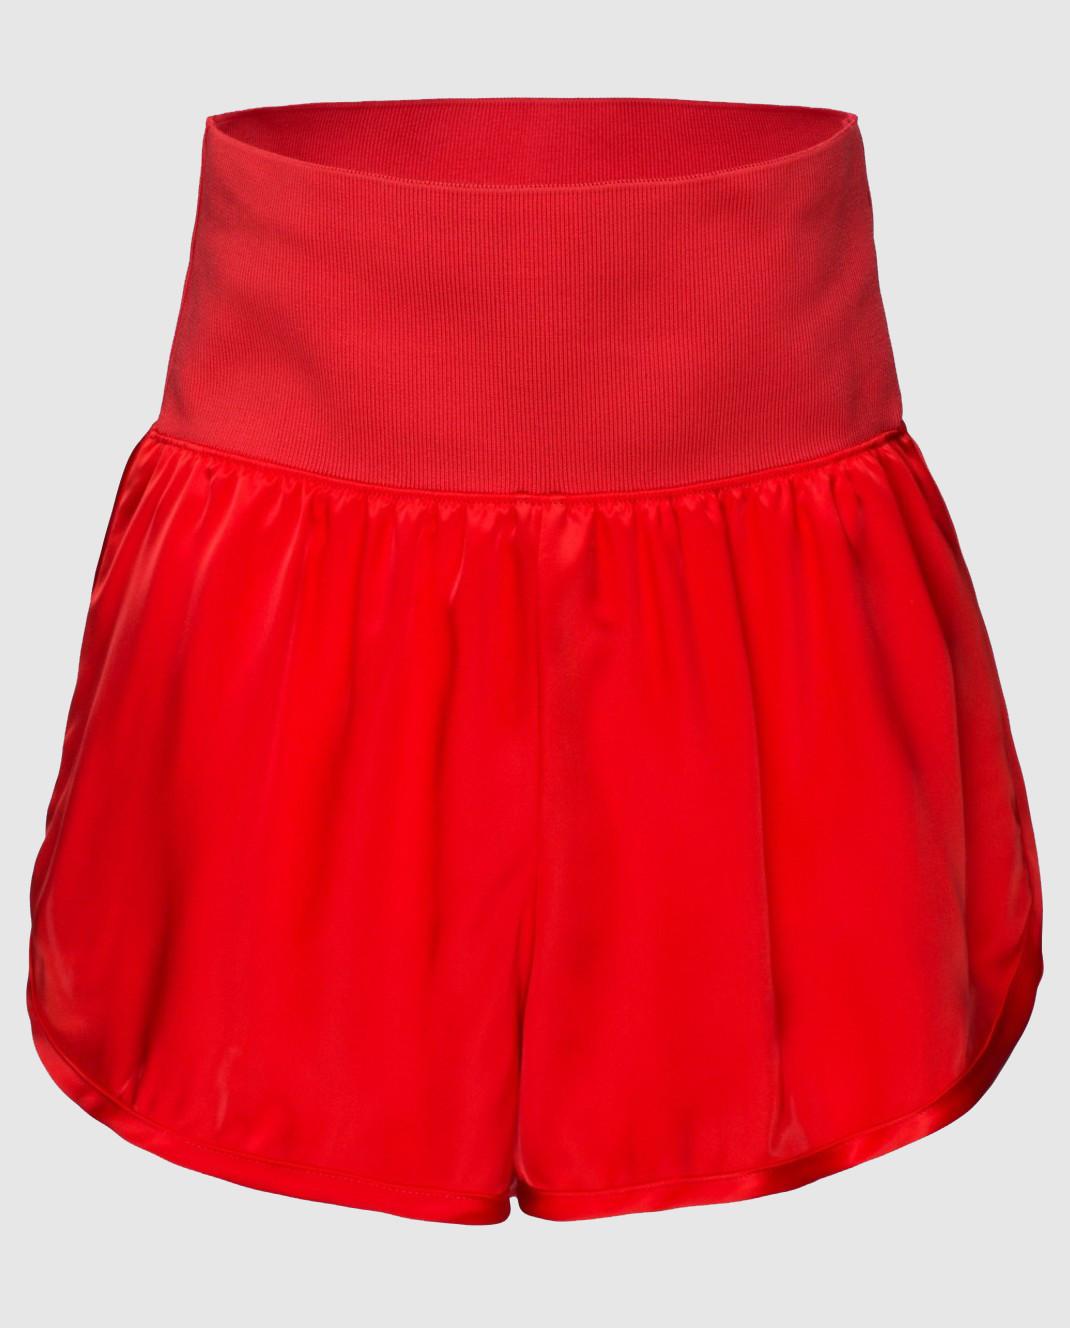 Sonia Rykiel Красные шорты 15402306